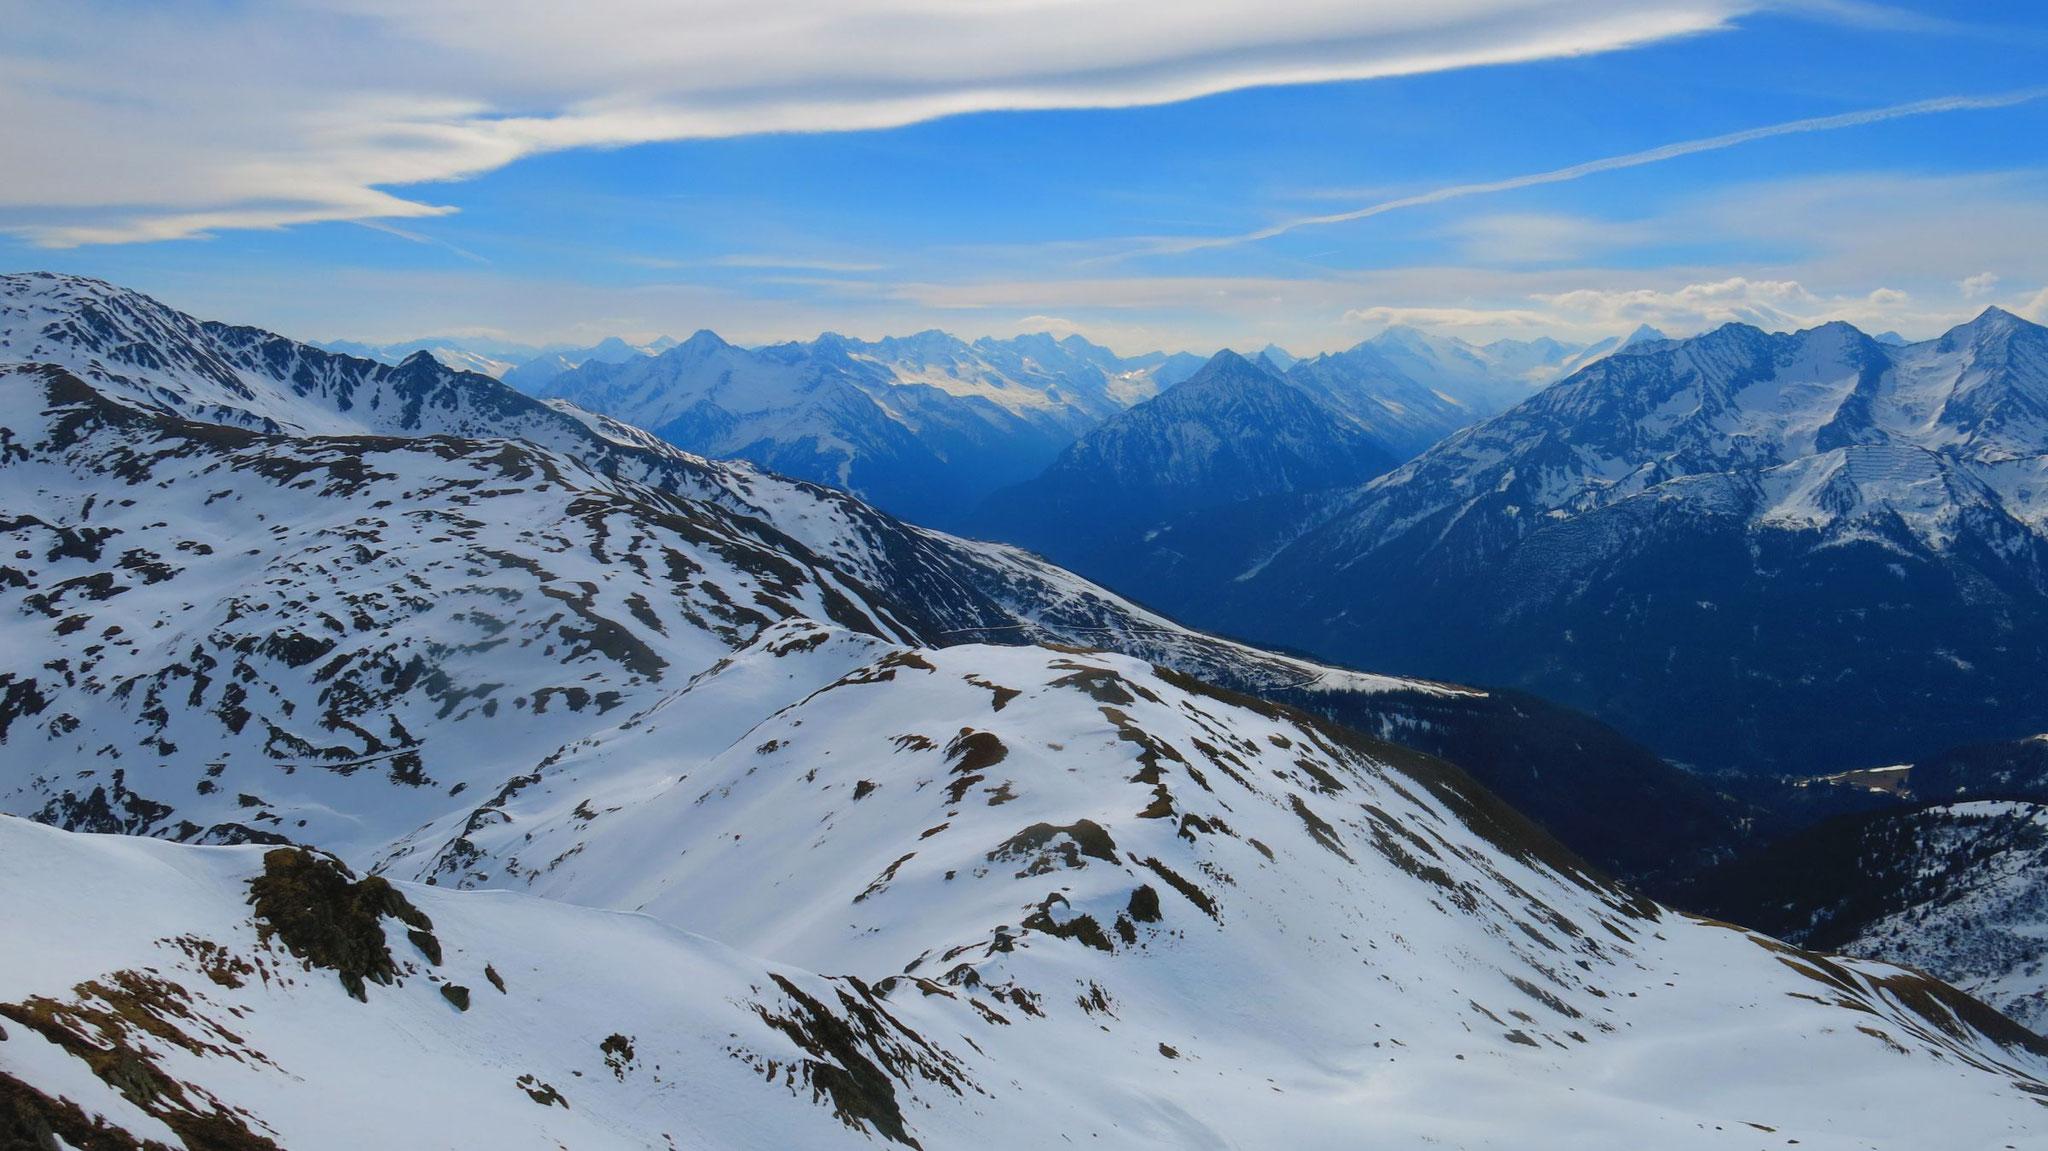 Zillertaler zwischen Ahornspitze und Großem Löffler